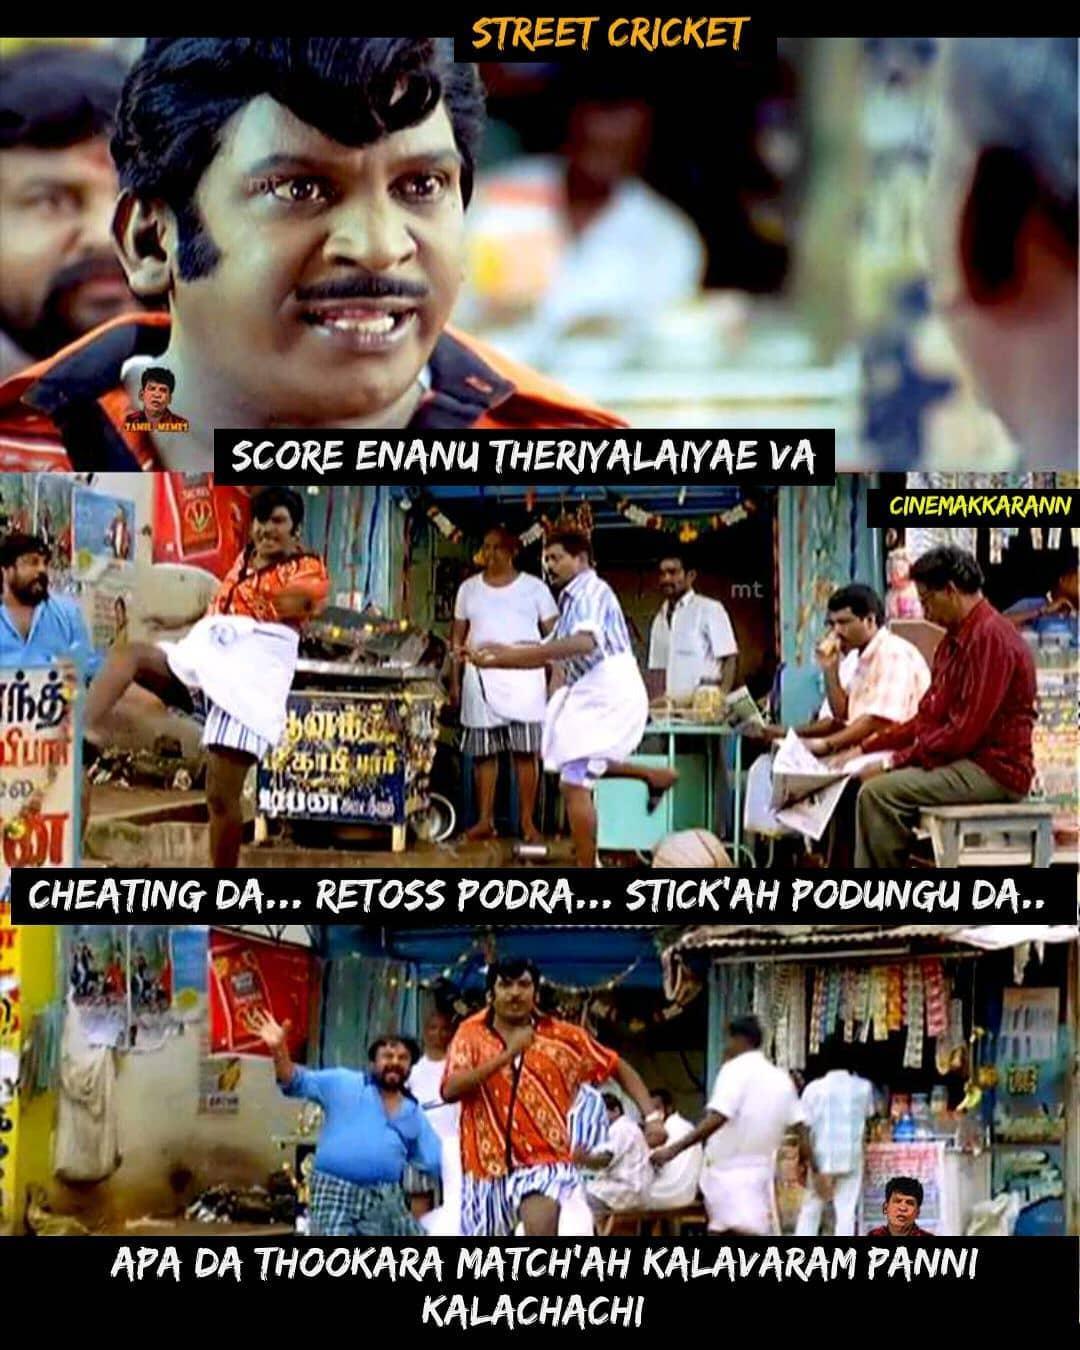 Cricket Funny Memes In Tamil : cricket, funny, memes, tamil, Street, Cricket, Memes, Tamil